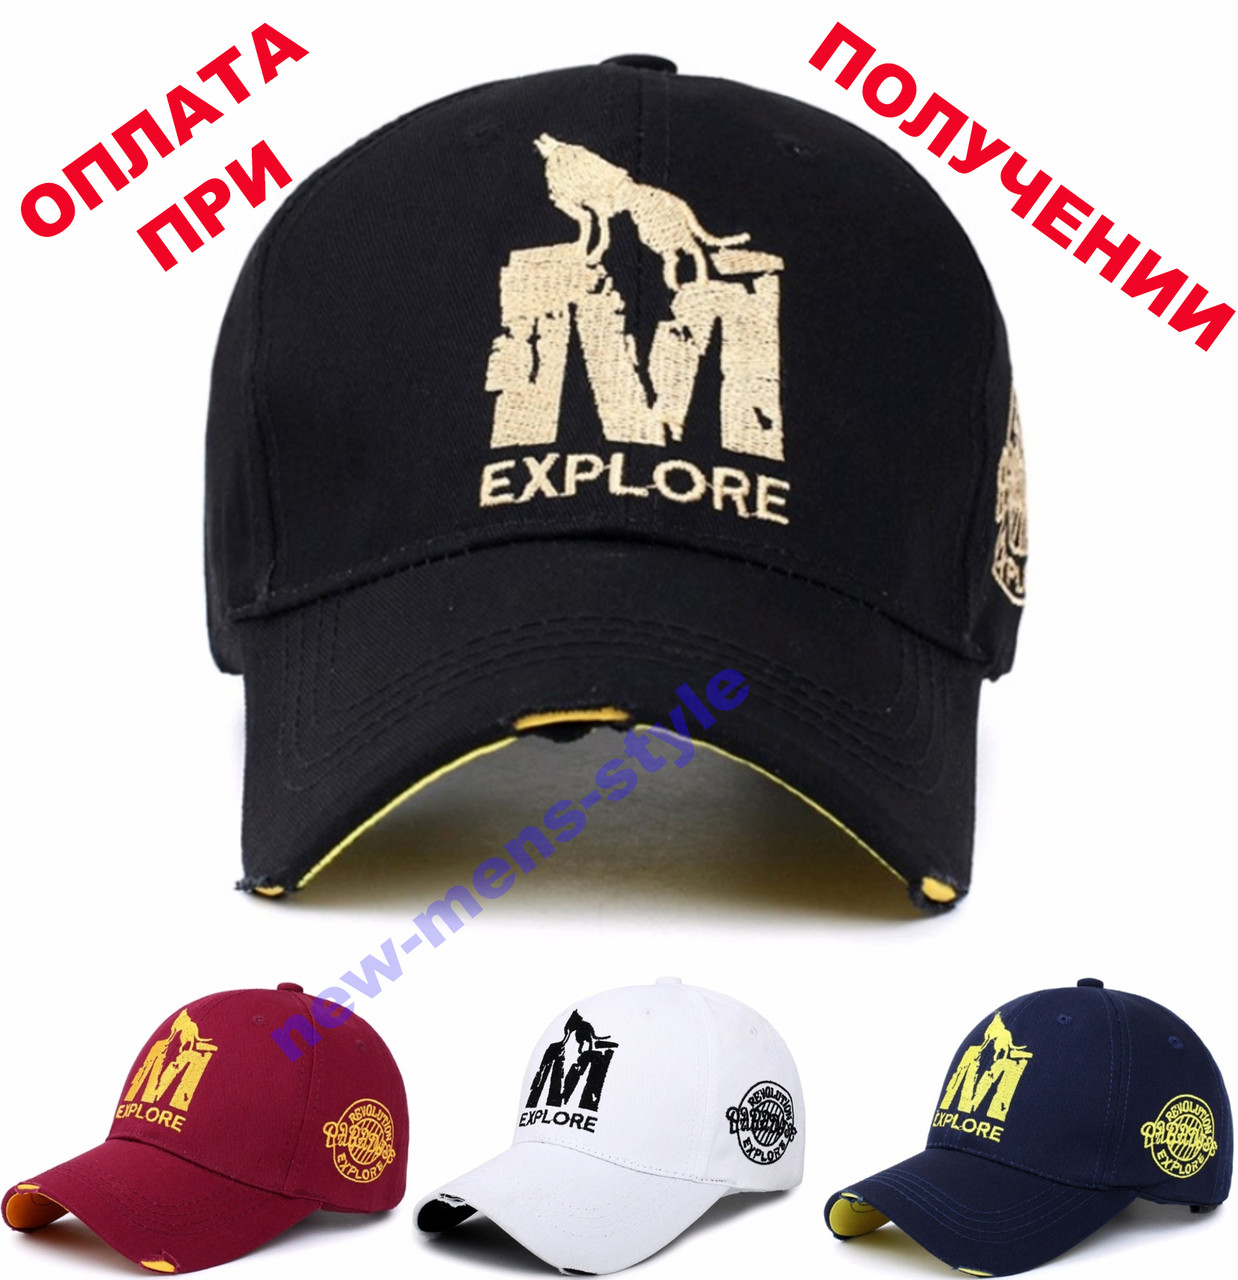 Чоловіча чоловіча фірмова стильна кепка бейсболка блайзер EXPLORE M